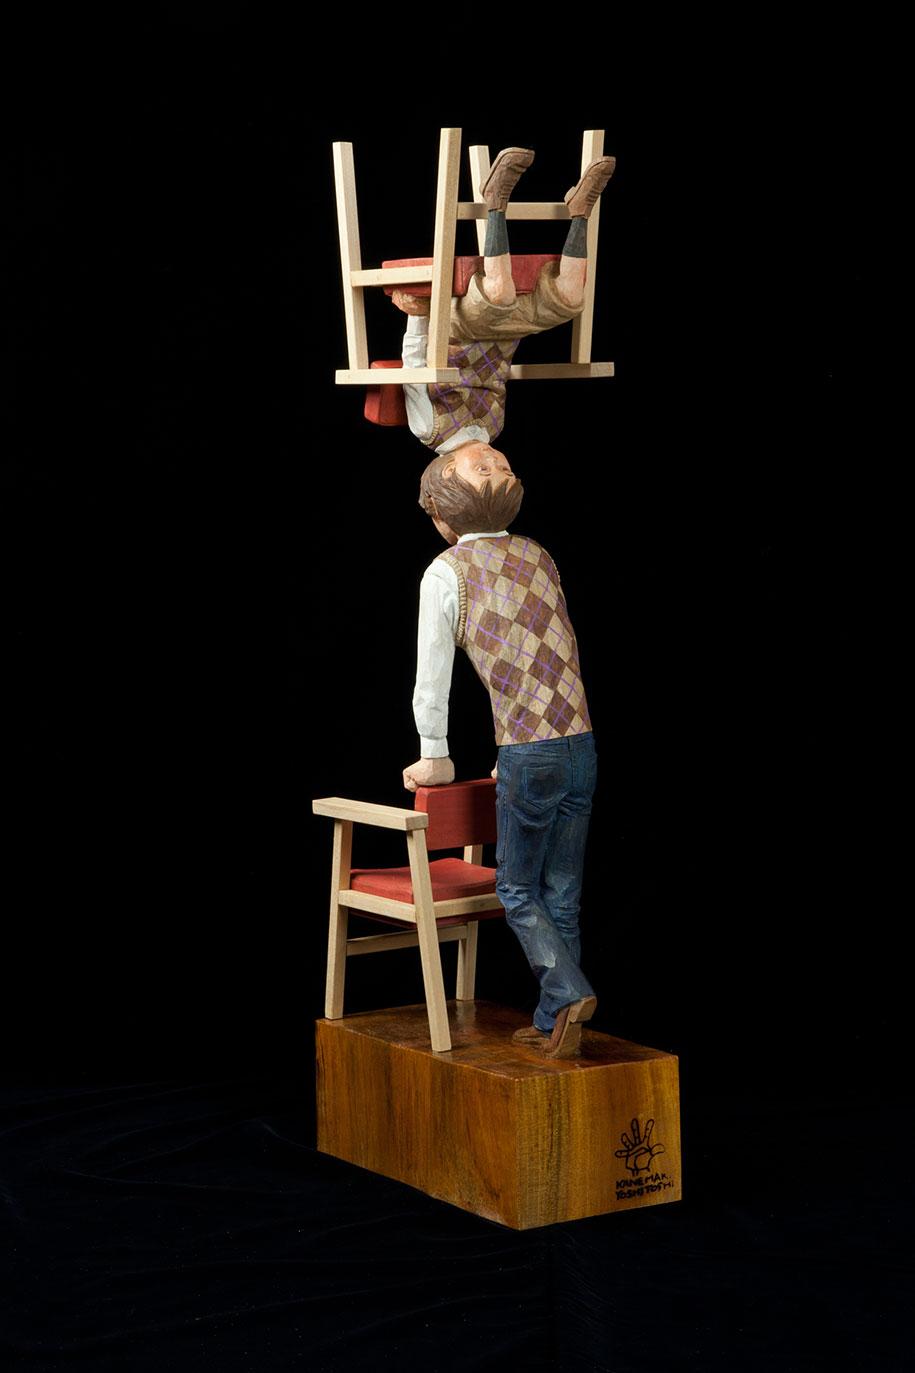 surreal-wooden-sculptures-yoshitoshi-kanemaki-41